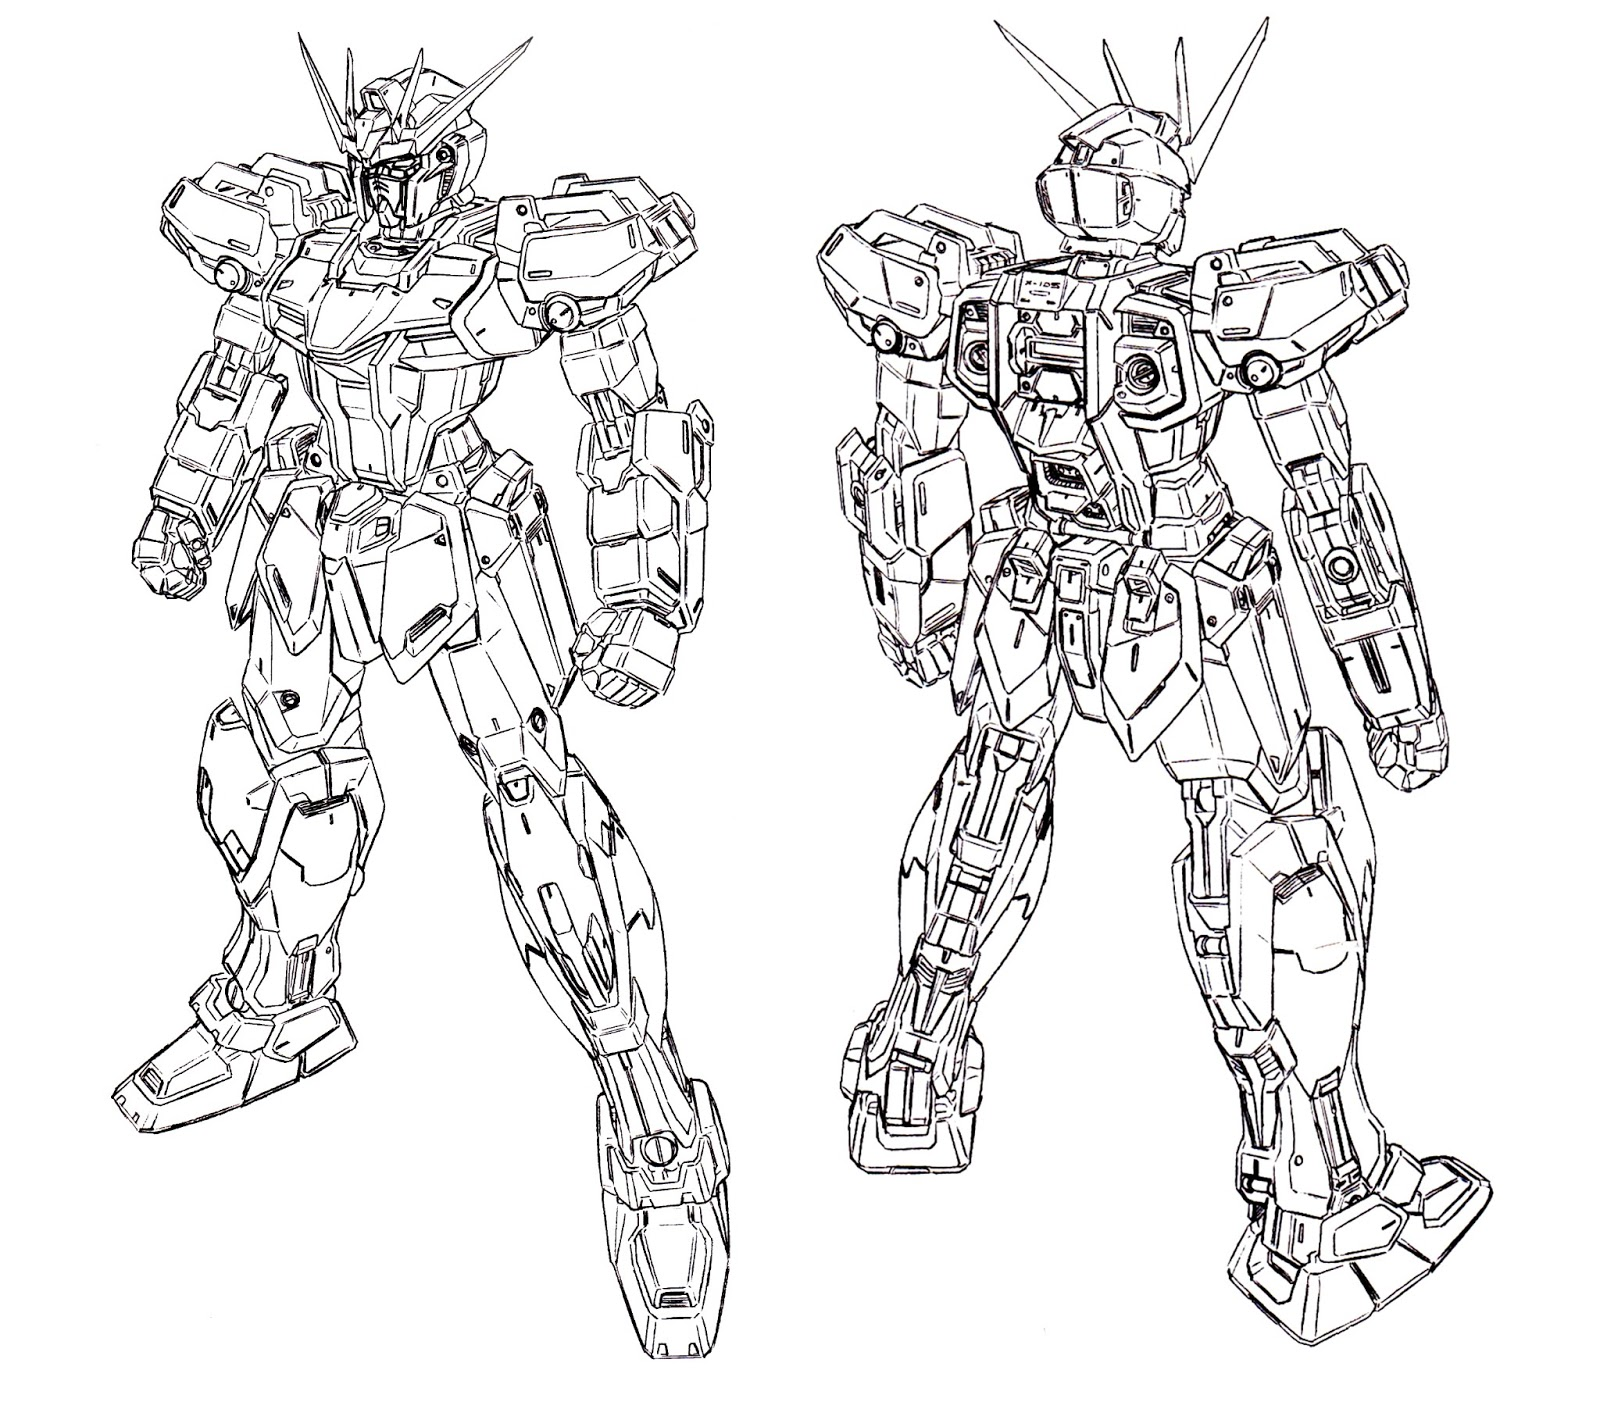 星仔走天涯: MG Aile Strike Gundam Ver.RM再度爆Seed